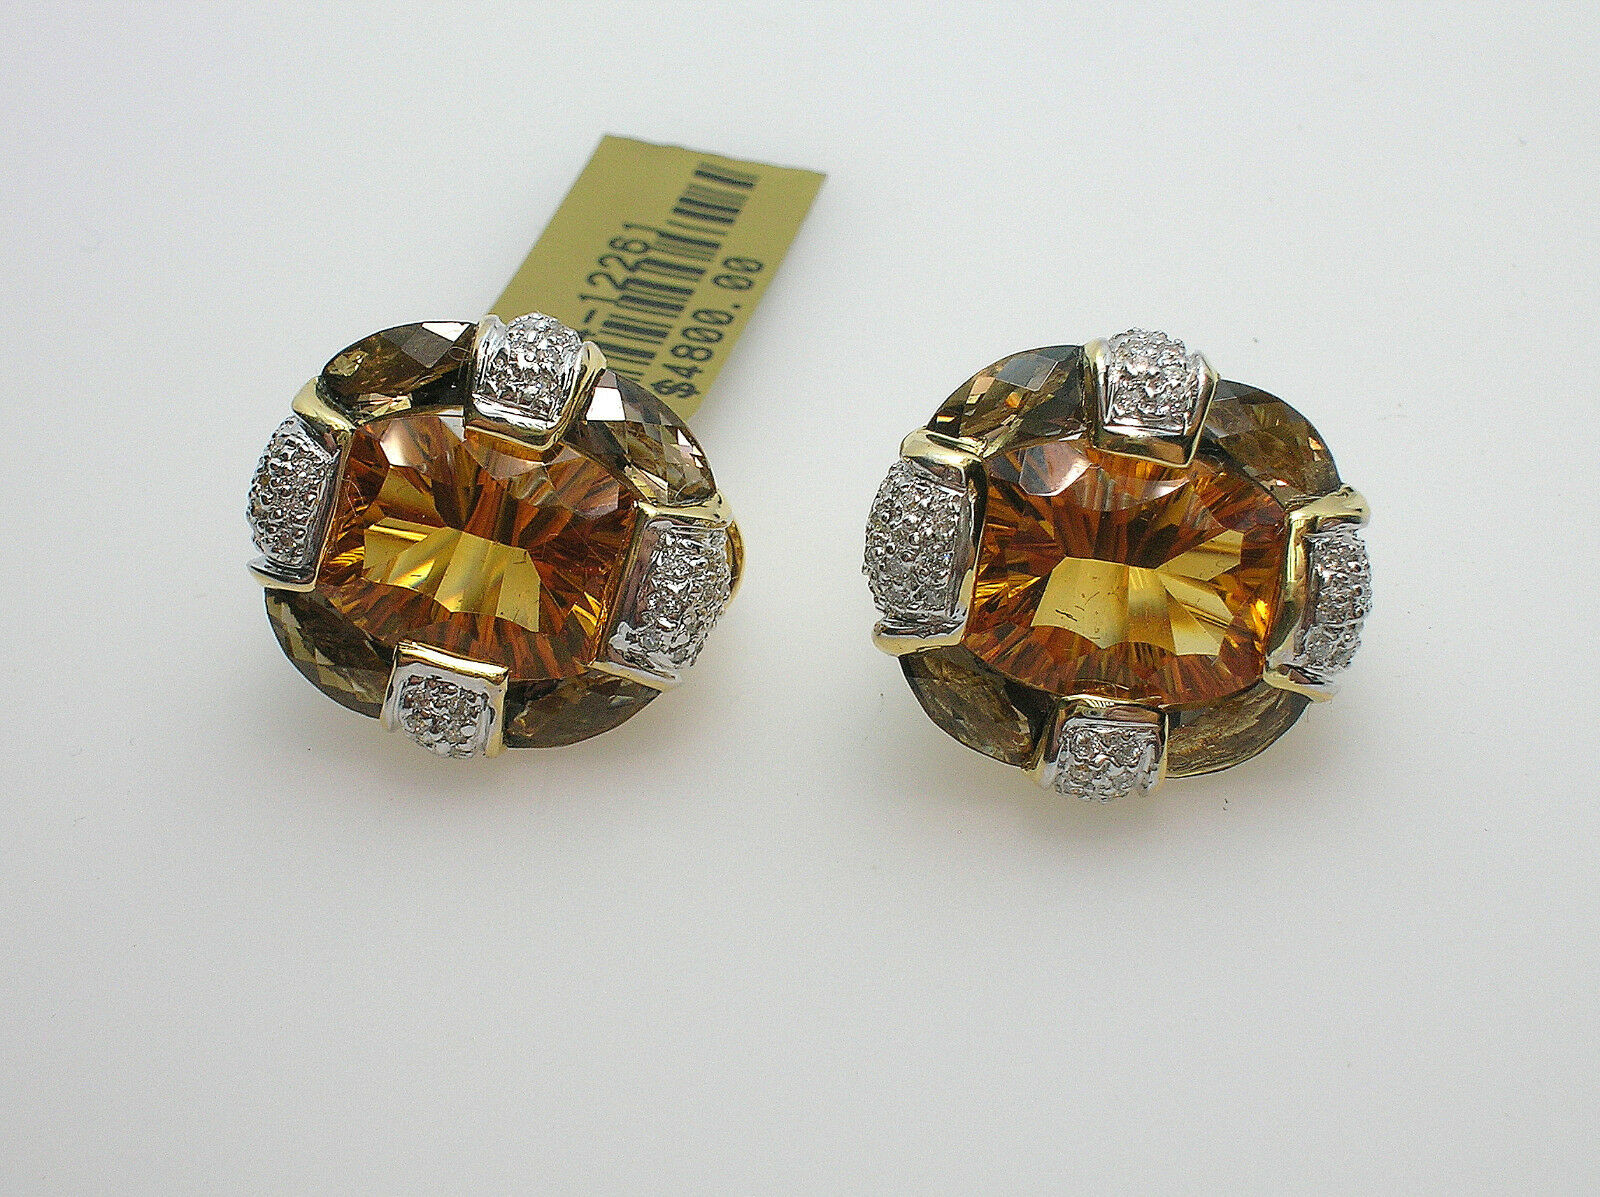 BELLARRI CITRINE QUARTZ & DIAMONDS EARRINGS 18K gold - NEW - RETAIL  4800.00